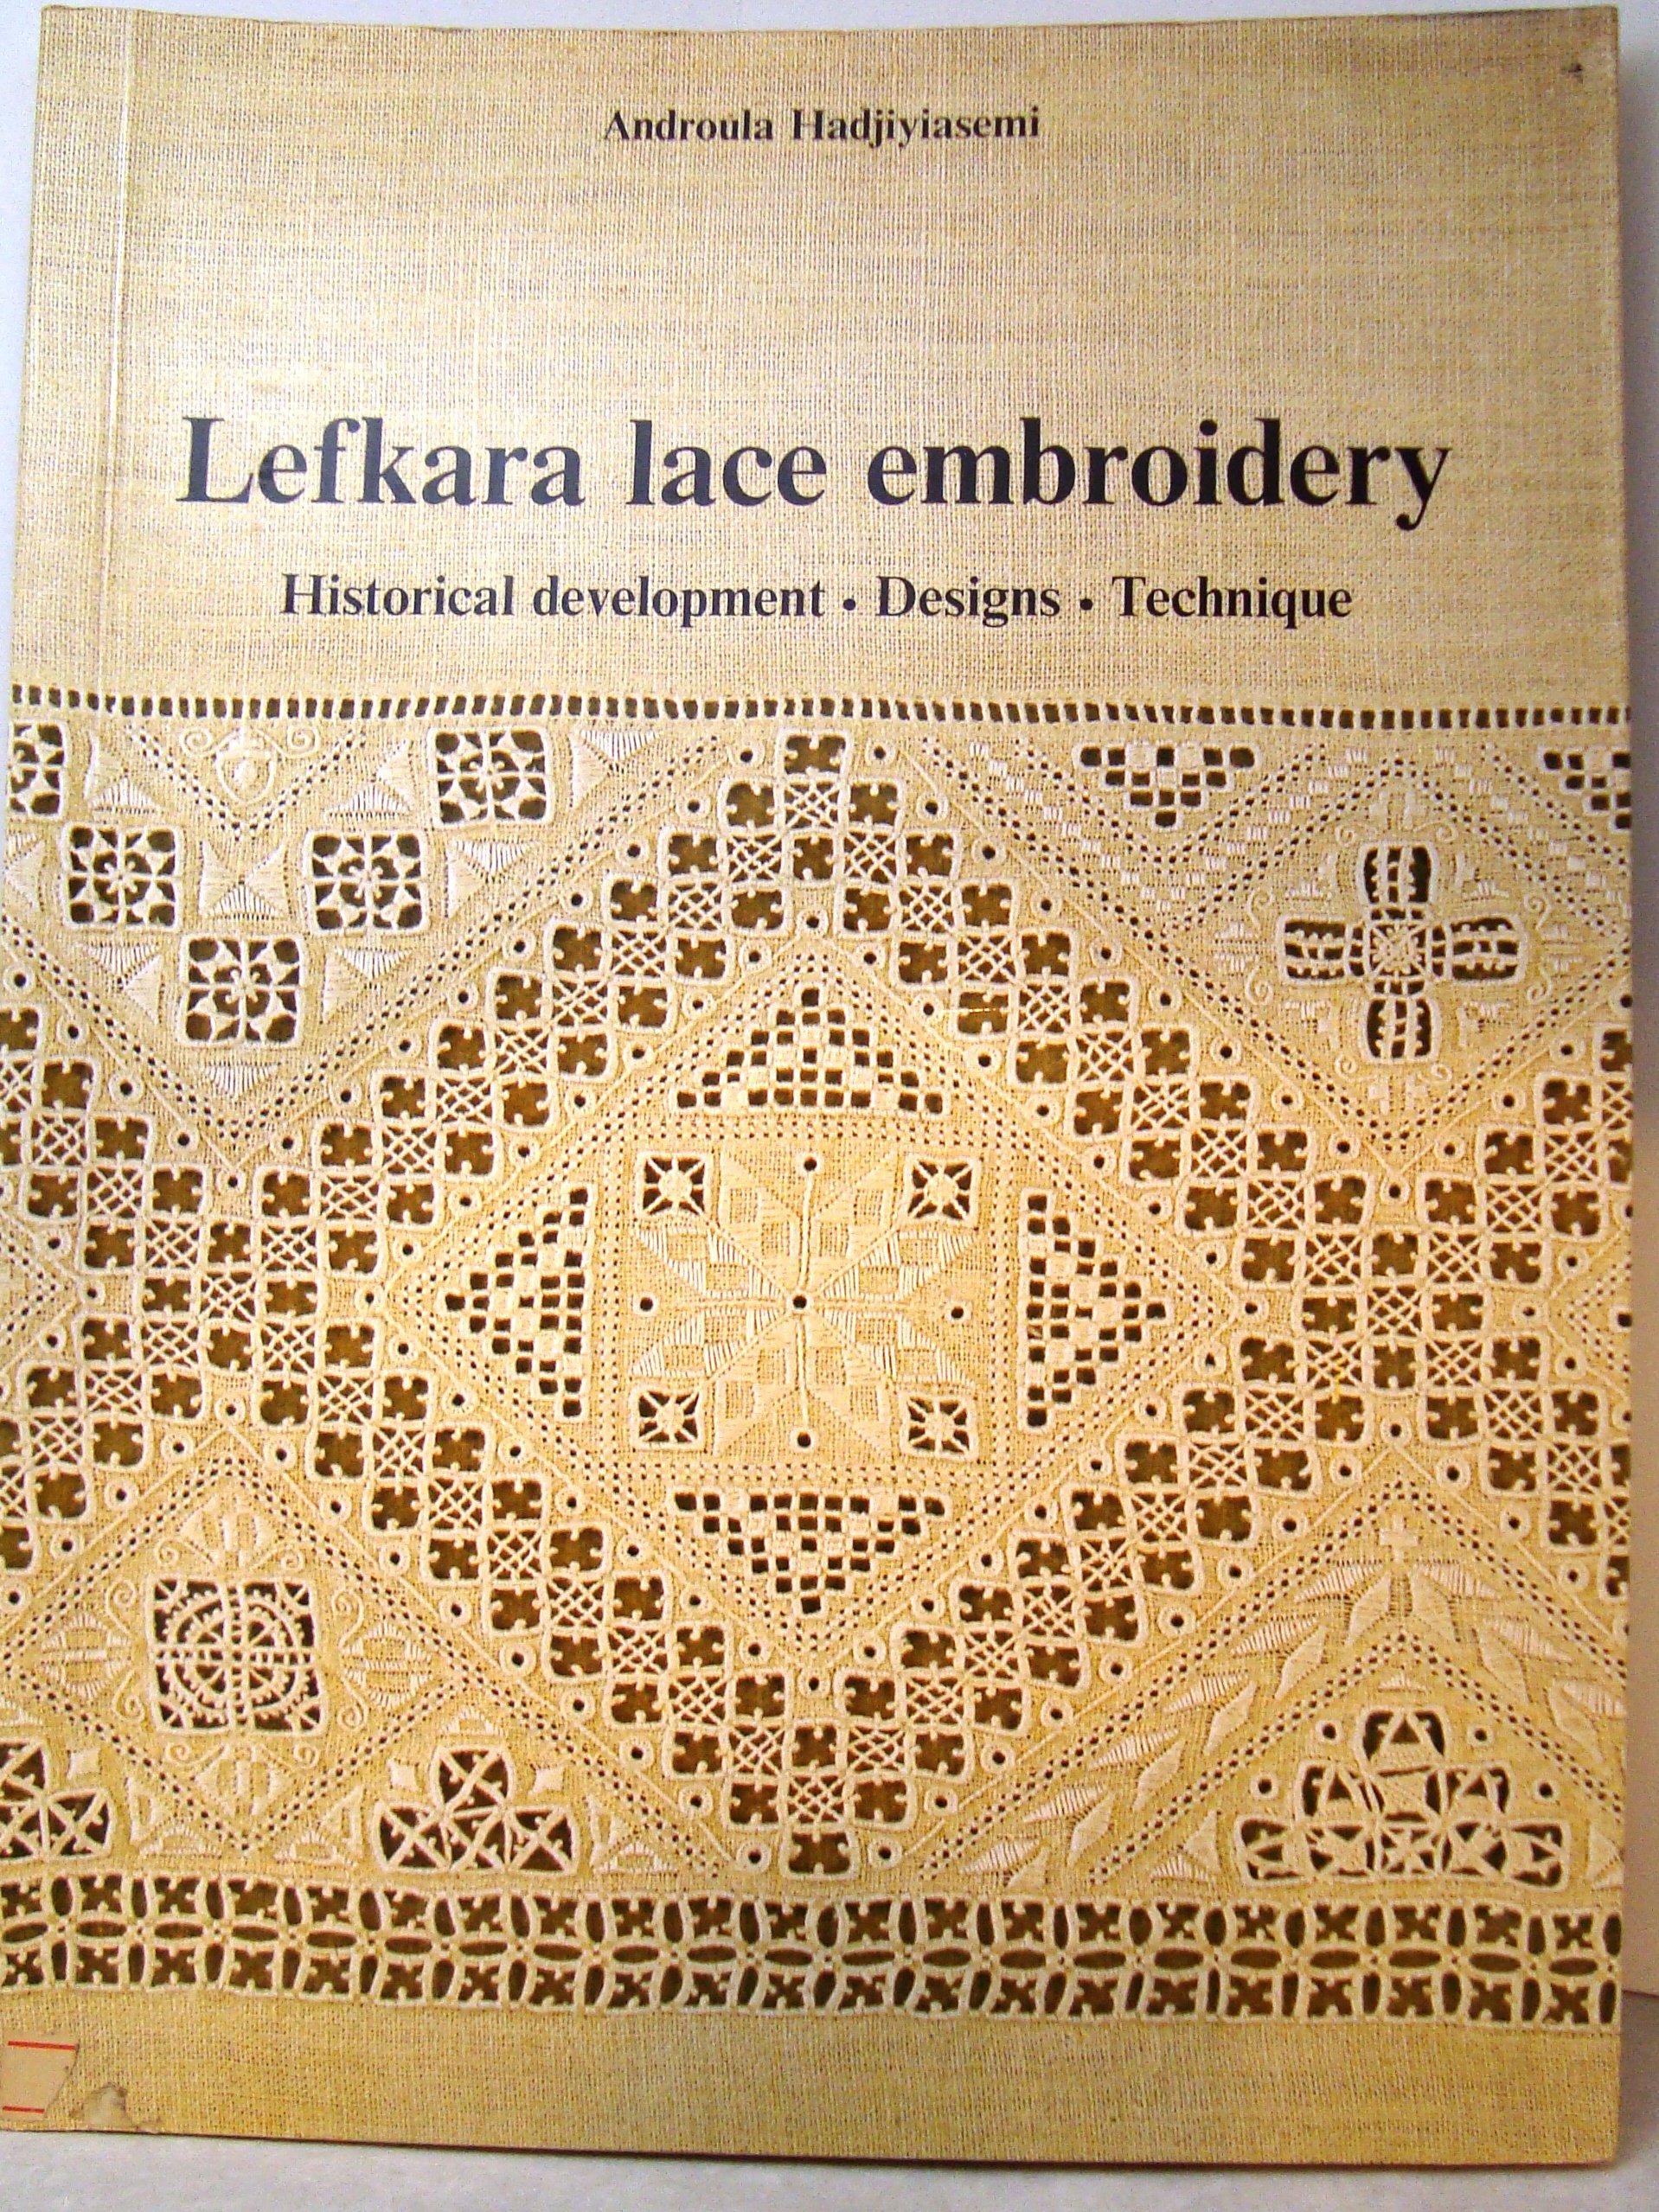 Lefkara Lace Embroidery: Historical Development - Designs - Technique